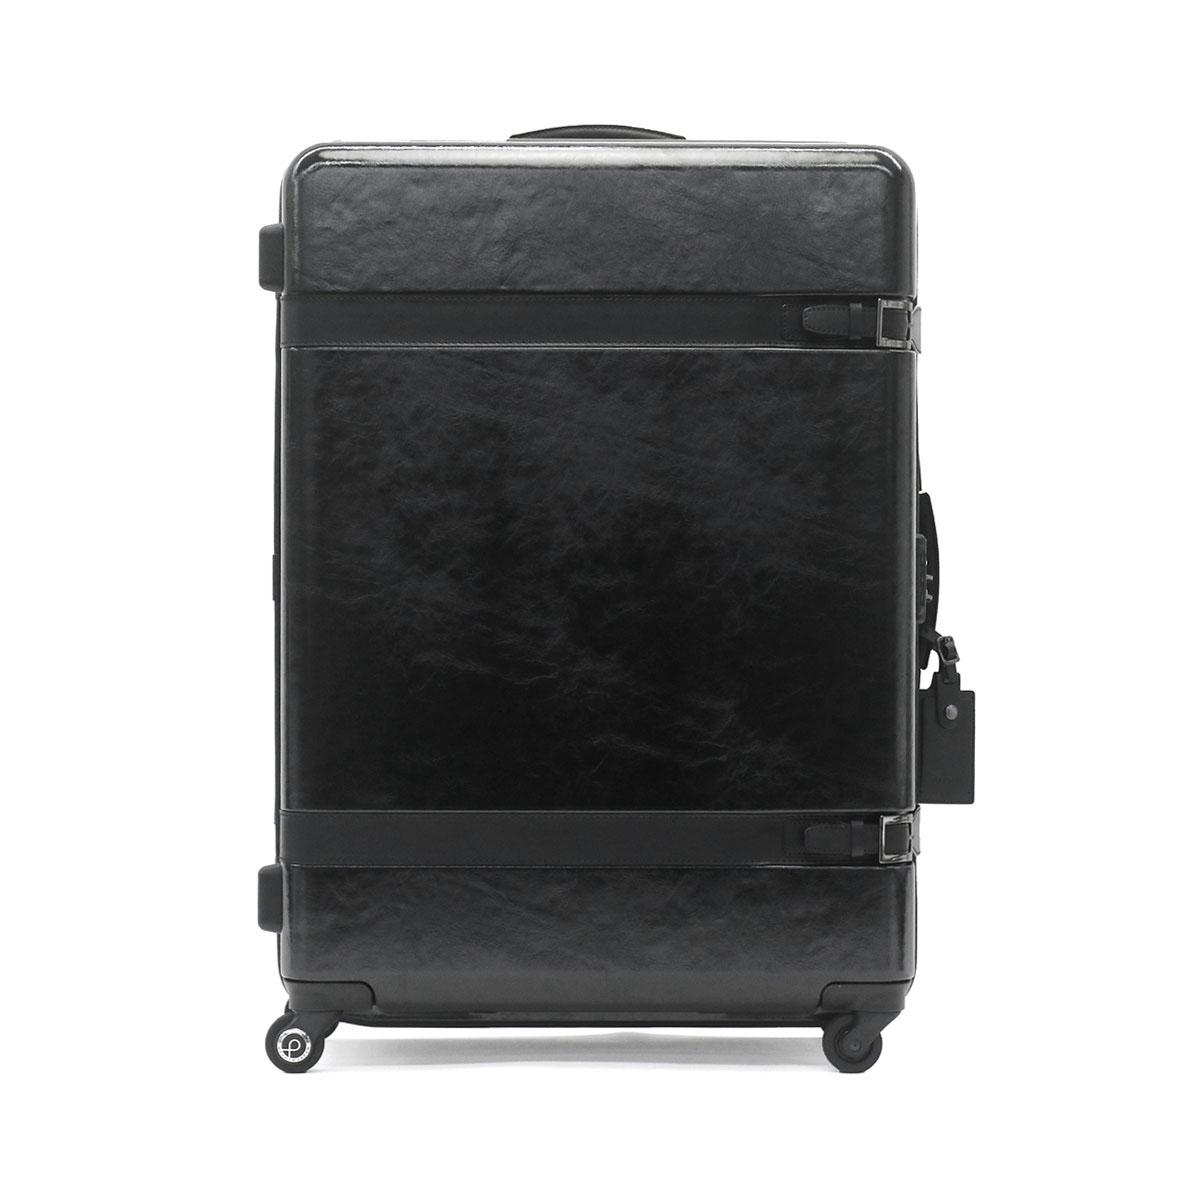 PROTeCA プロテカ GENIO CENTURY Z ジーニオ センチュリー Z ブラックエディション スーツケース 115L 08953